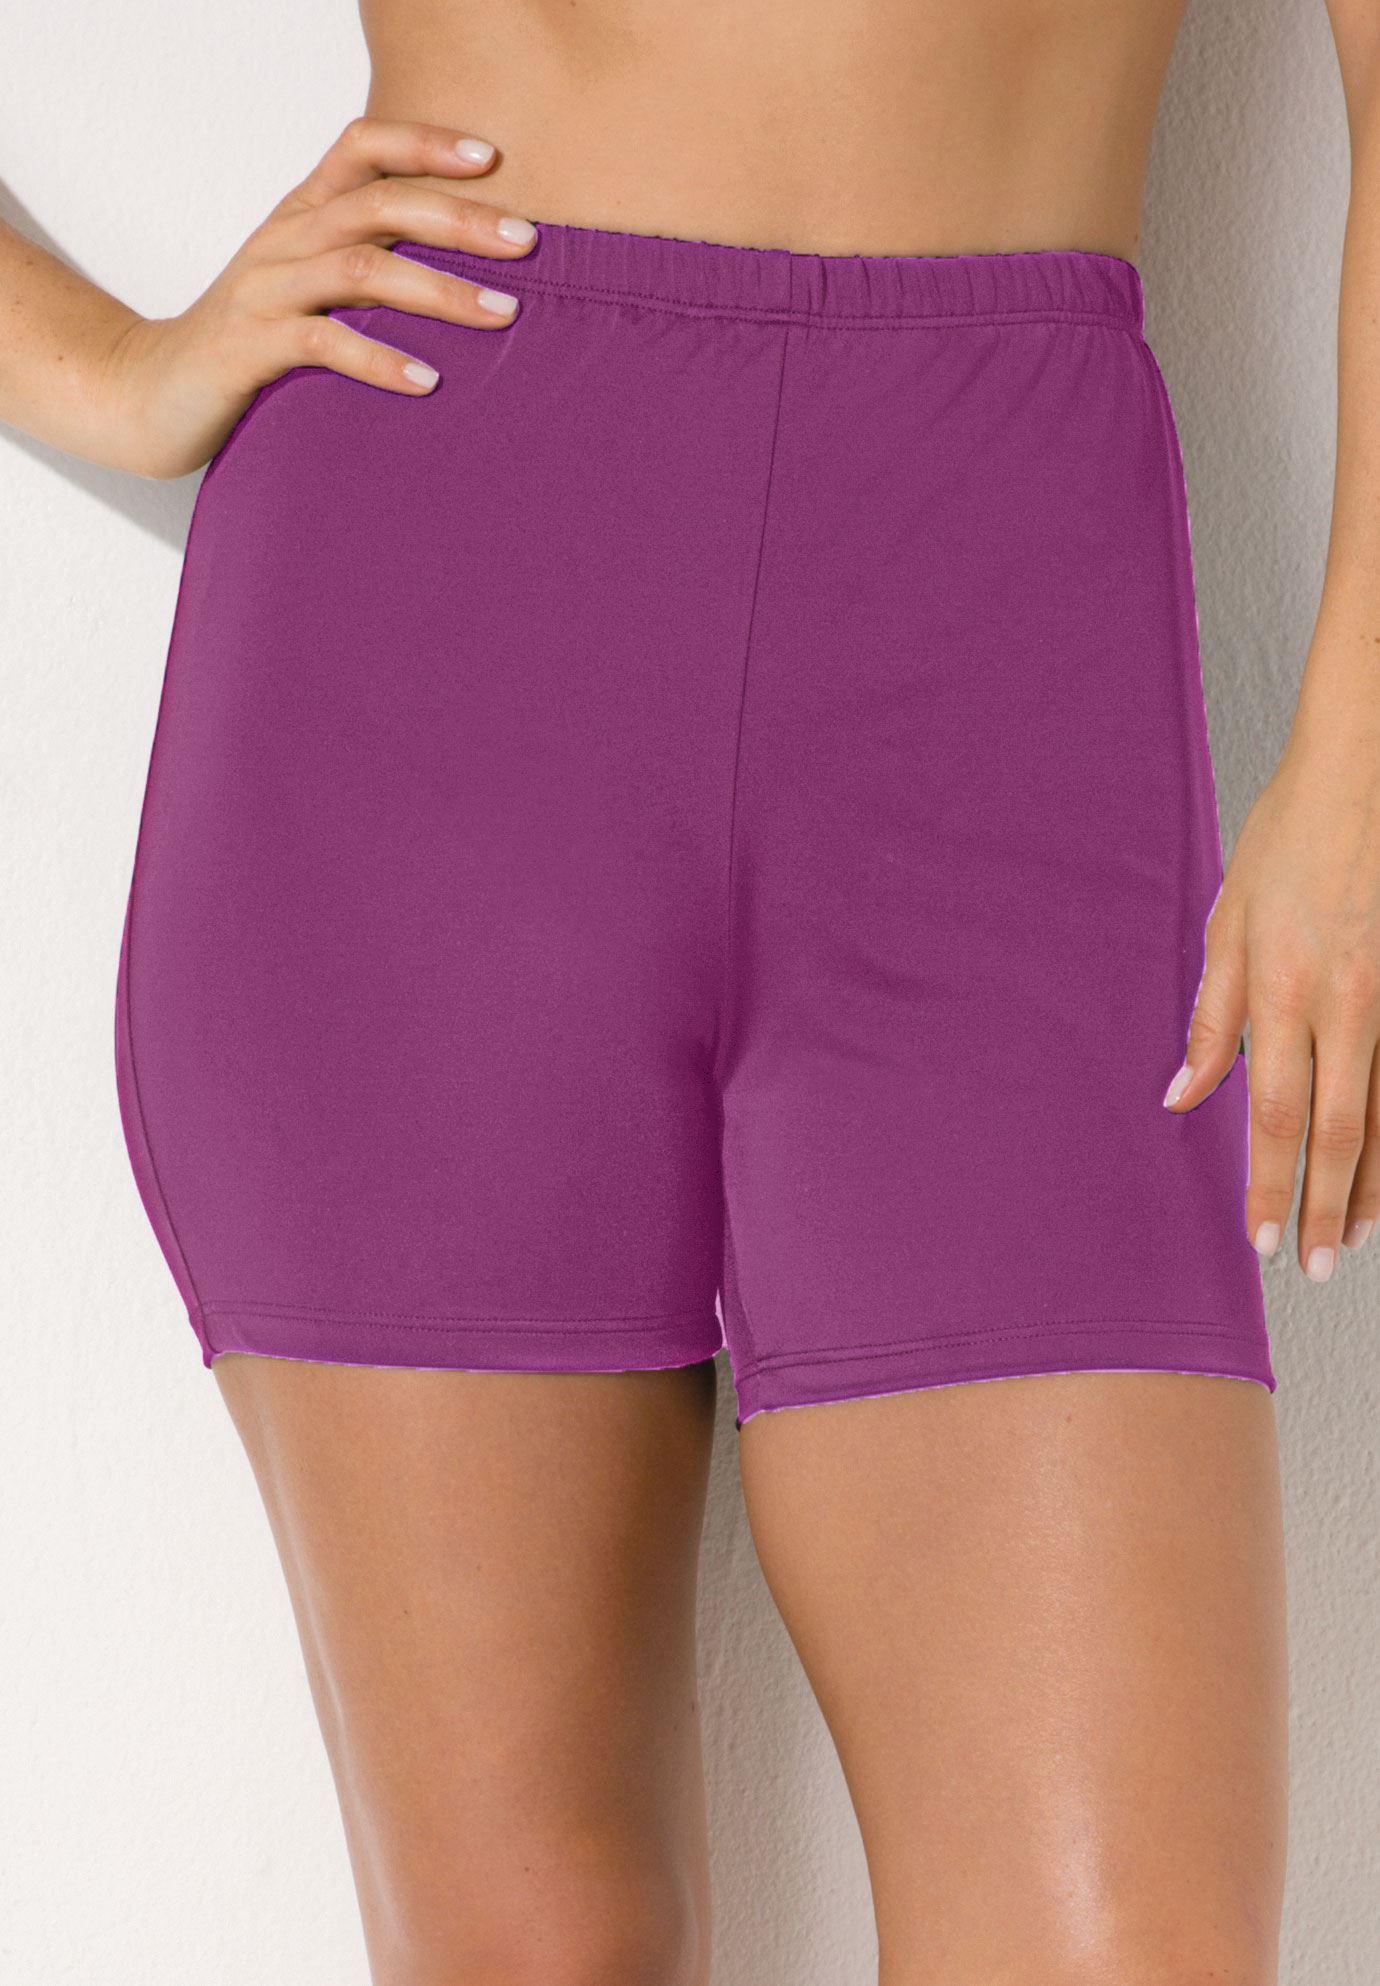 8ecf06dfac Plus Size Boy shorts | Clothes for Gina, Swimwear | Gym shorts ...